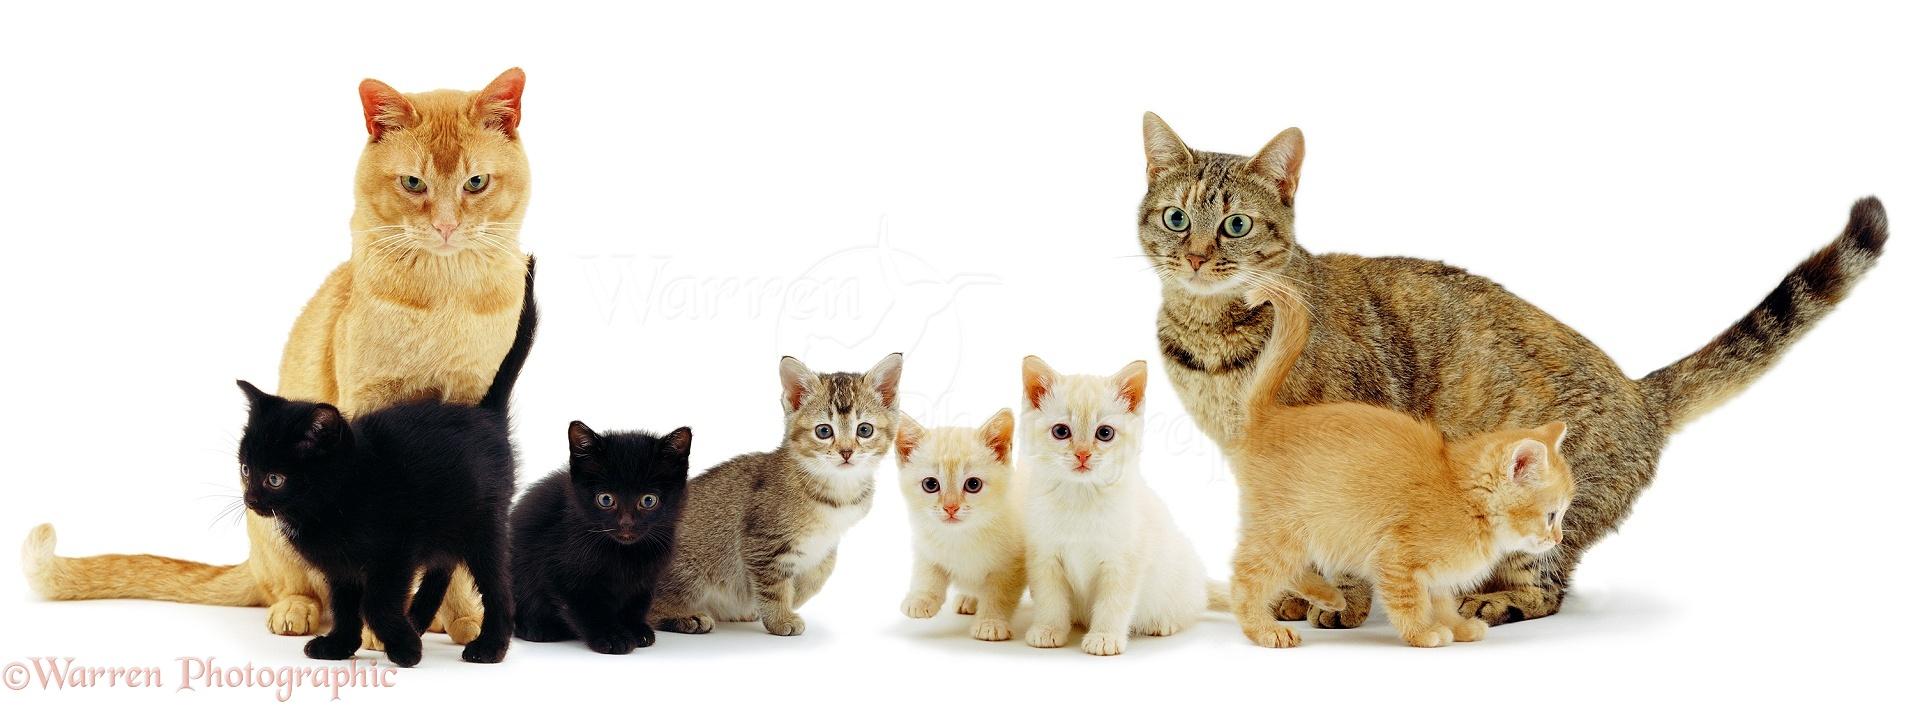 Hasil gambar untuk cat family